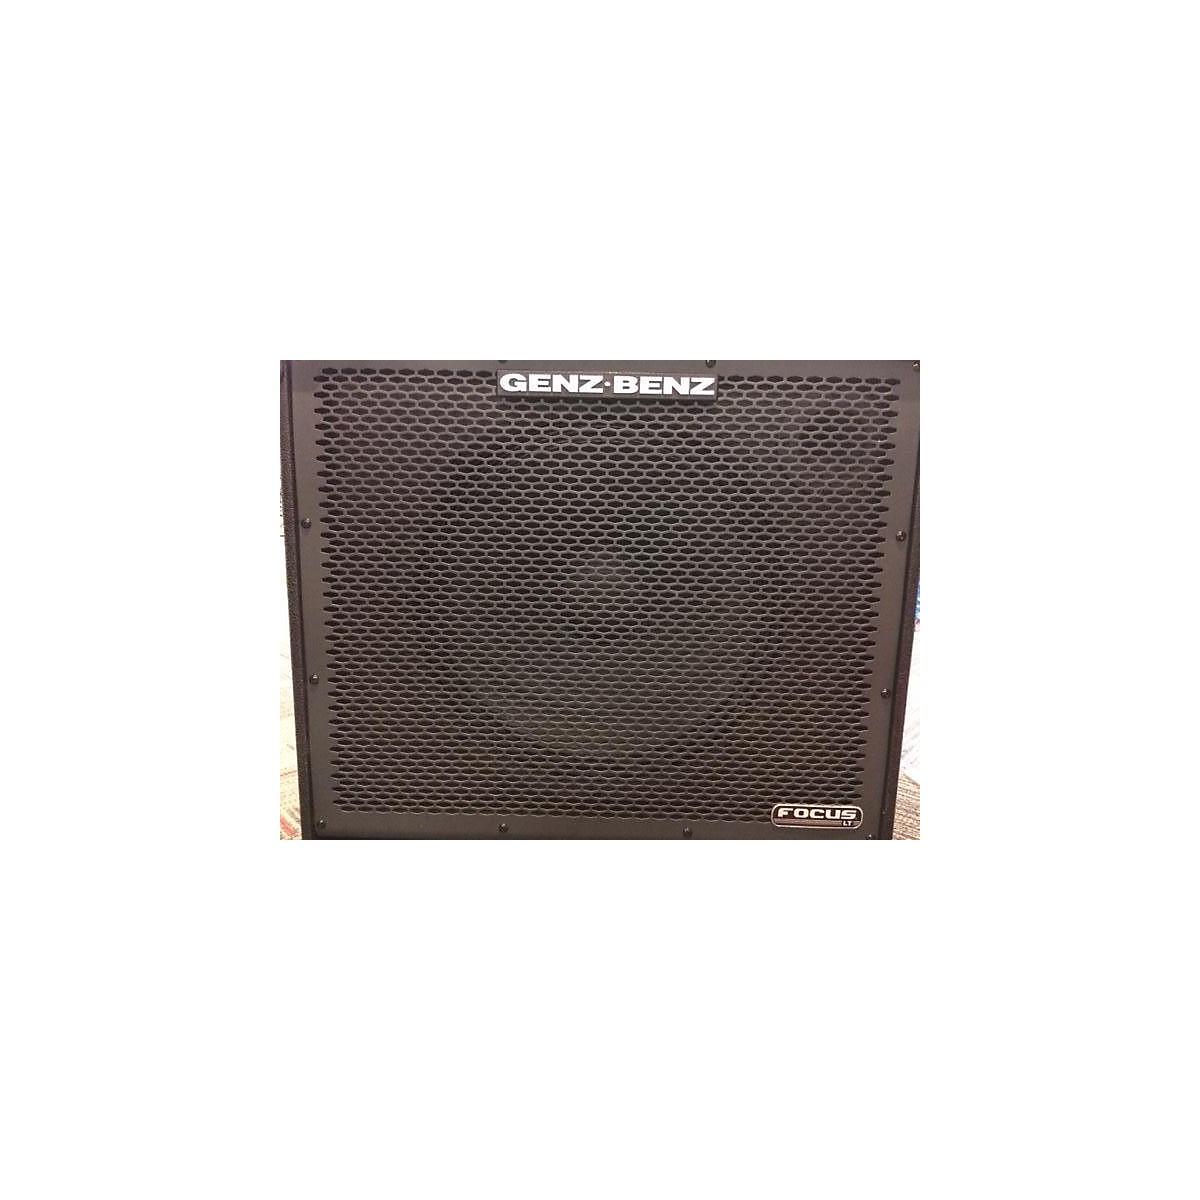 Genz Benz FCS115T 300W 1X15 Bass Cabinet